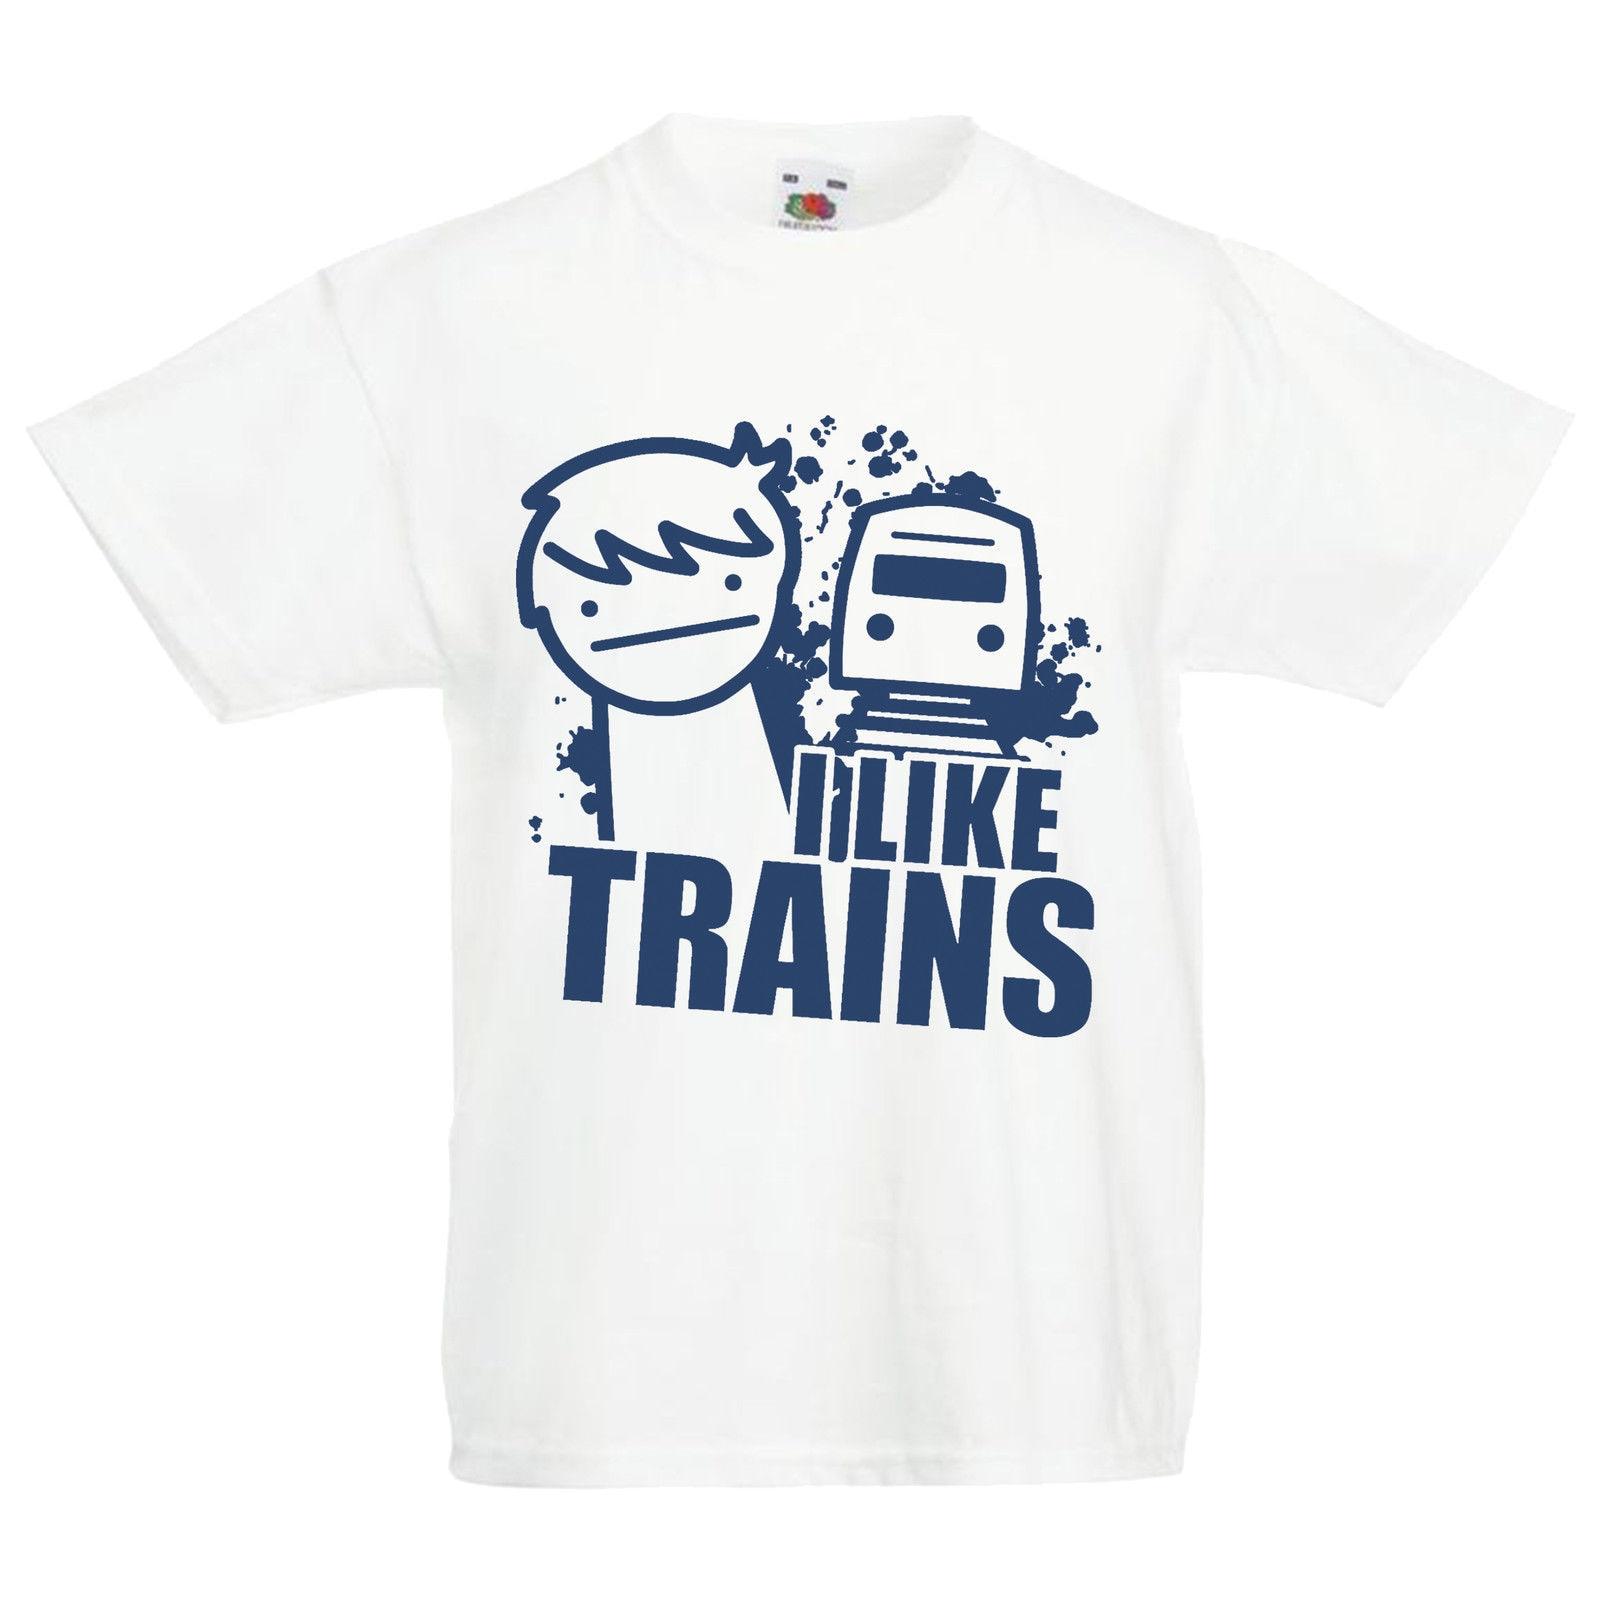 'i Wie Trains' Asdf Inspiriert Parody Lustige Comic Kinder T Shirt Männer T-shirts Sommer Stil Mode Swag Männer T Shirts Cartoon